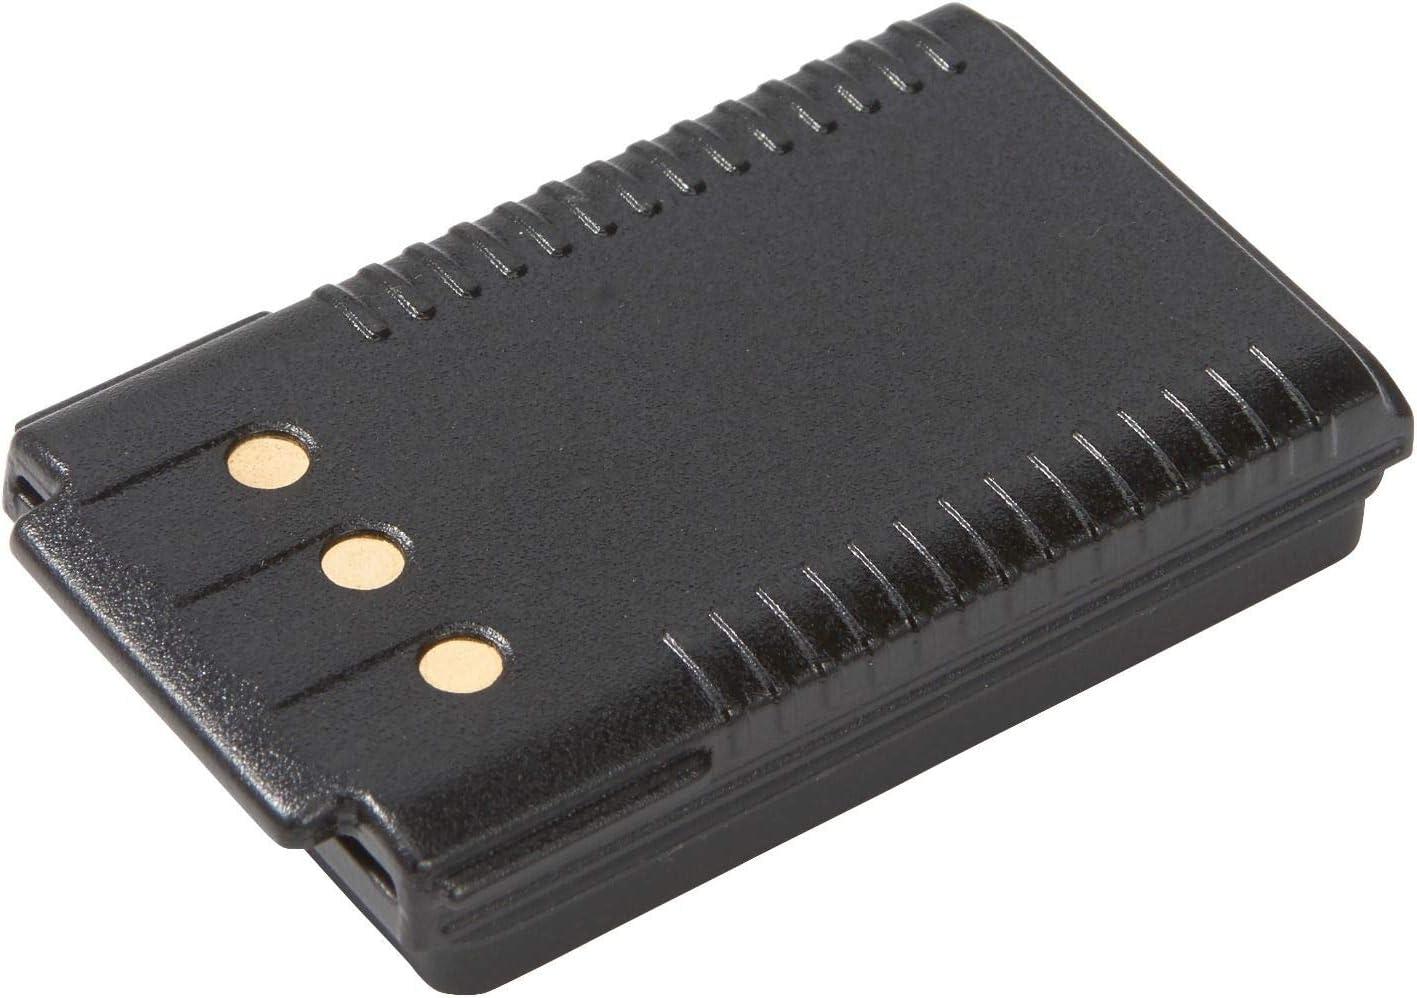 Includes Yaesu SBR-24LI 1,800mAh Li-ion Battery SBH-28 Desktop Rapid Charger and Ham Guides TM Quick Reference Card 3 Items Yaesu FT-70DR Accessory Bundle